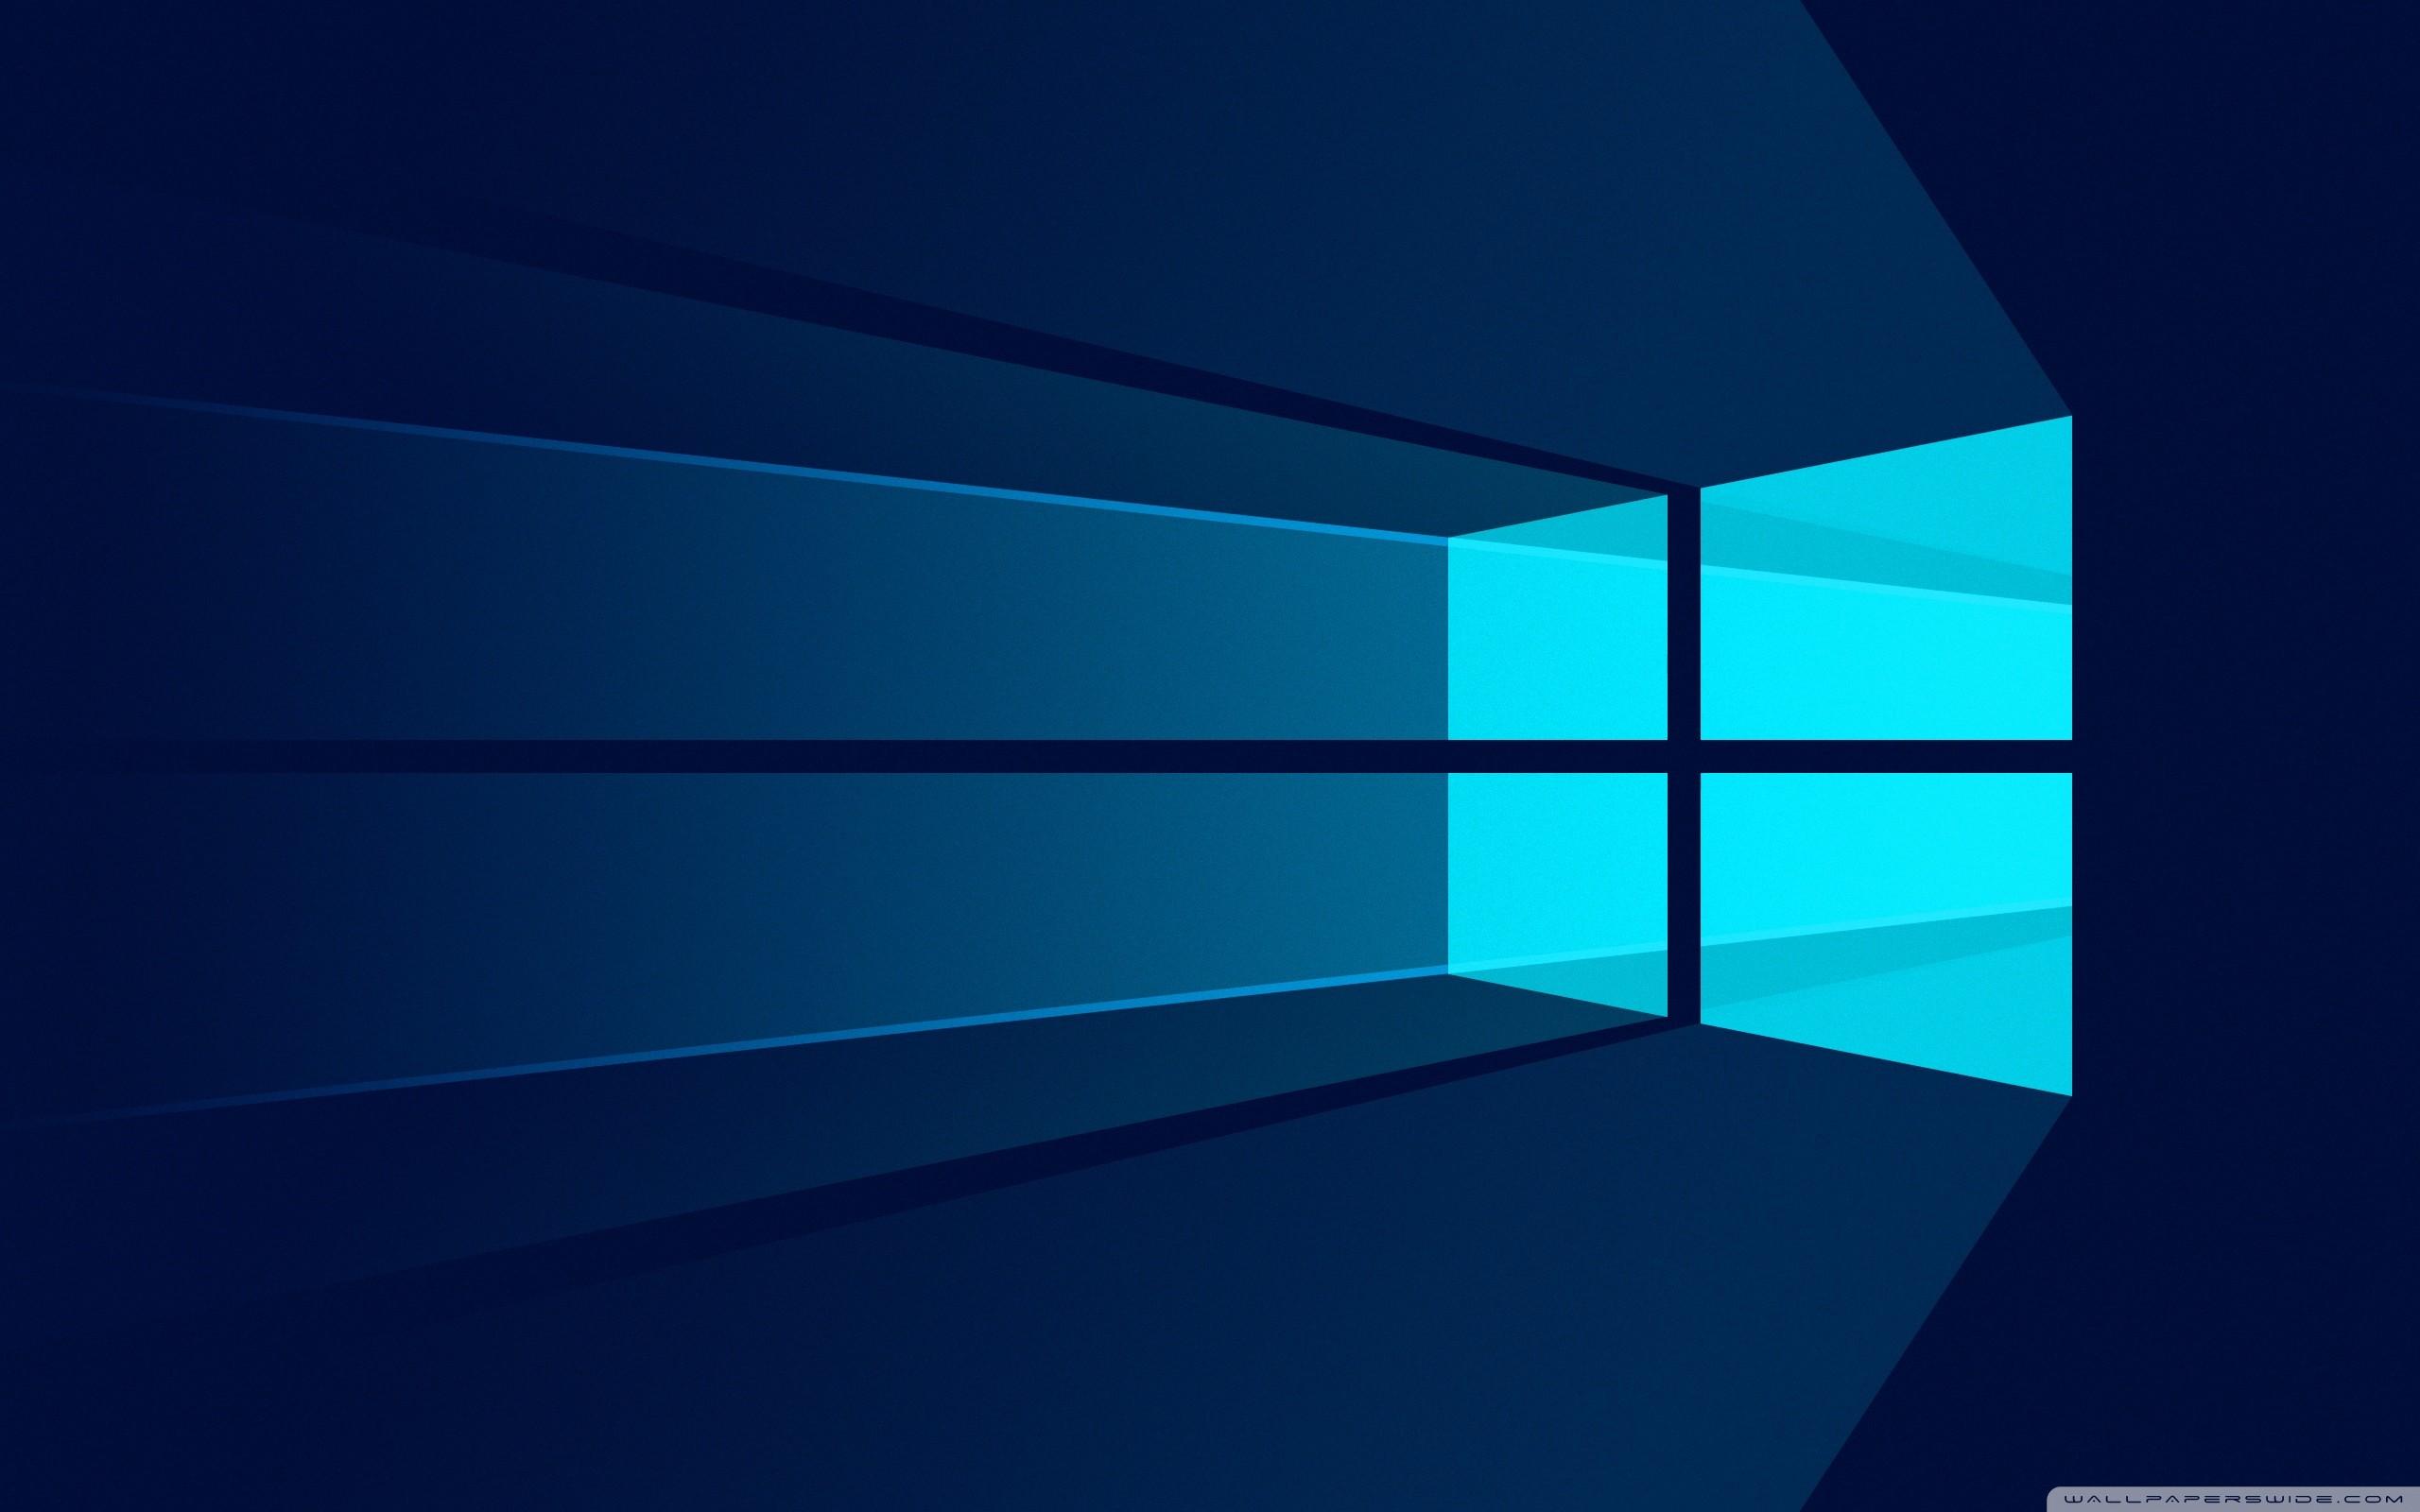 Windows 10 Hd Desktop Wallpaper 74 Images